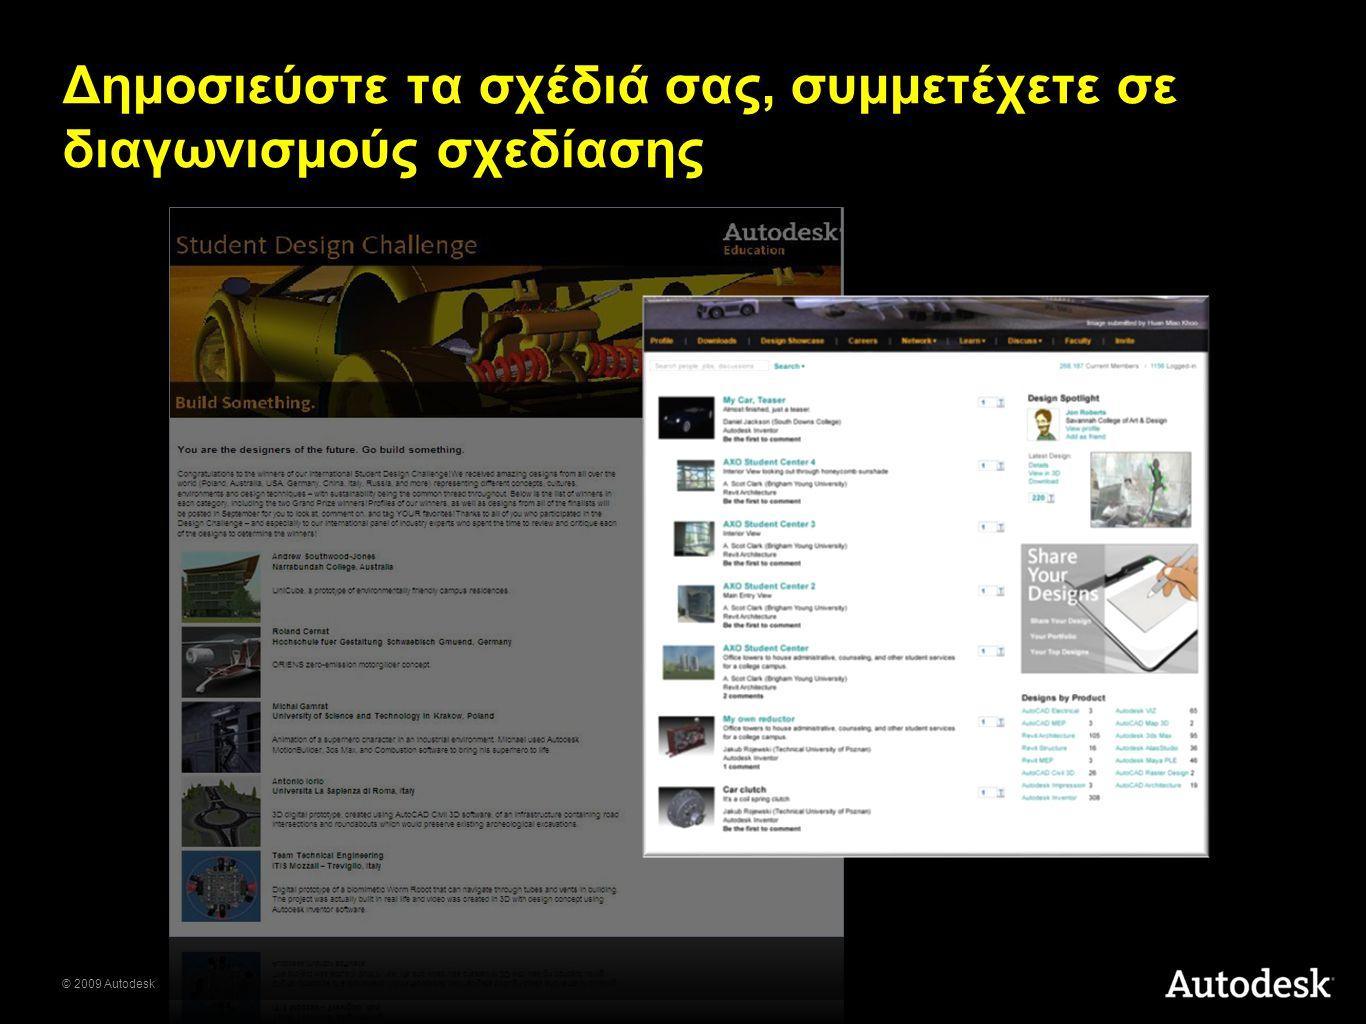 © 2009 Autodesk Δημοσιεύστε τα σχέδιά σας, συμμετέχετε σε διαγωνισμούς σχεδίασης